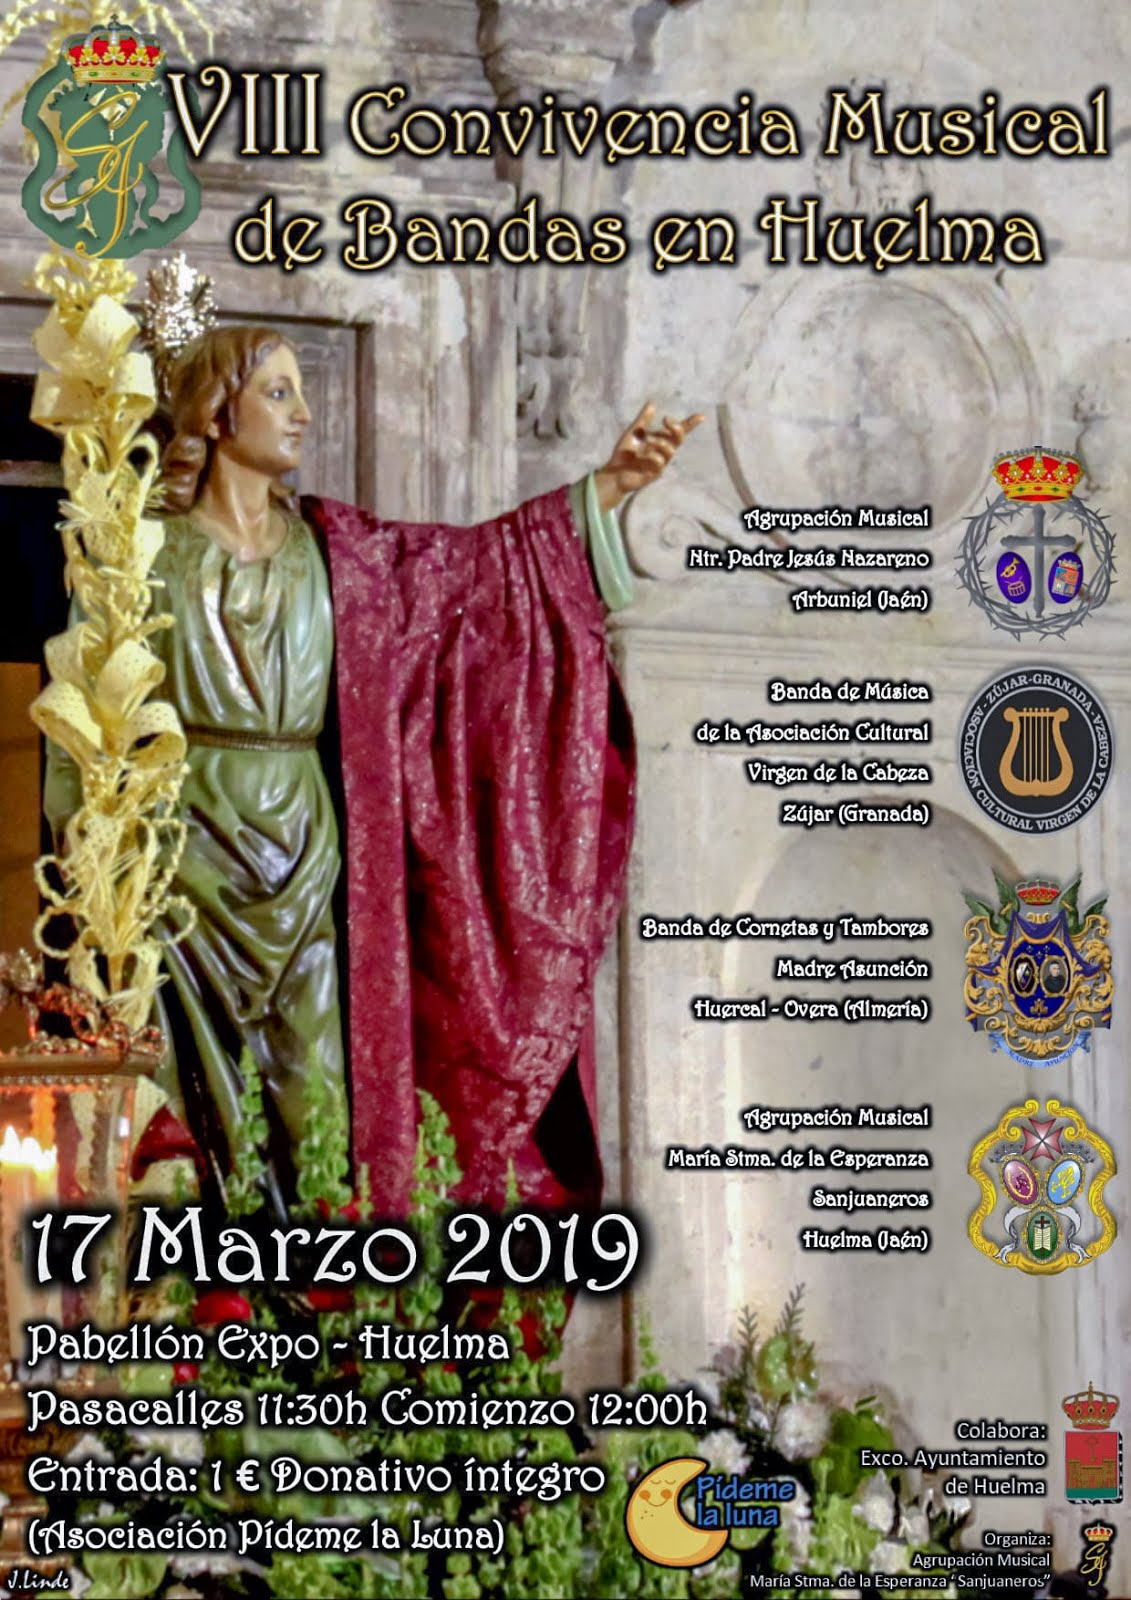 DOMINGO 17 DE MARZO 2019. VIII CONVIVENCIA MUSICAL DE BANDAS EN HUELMA 2019